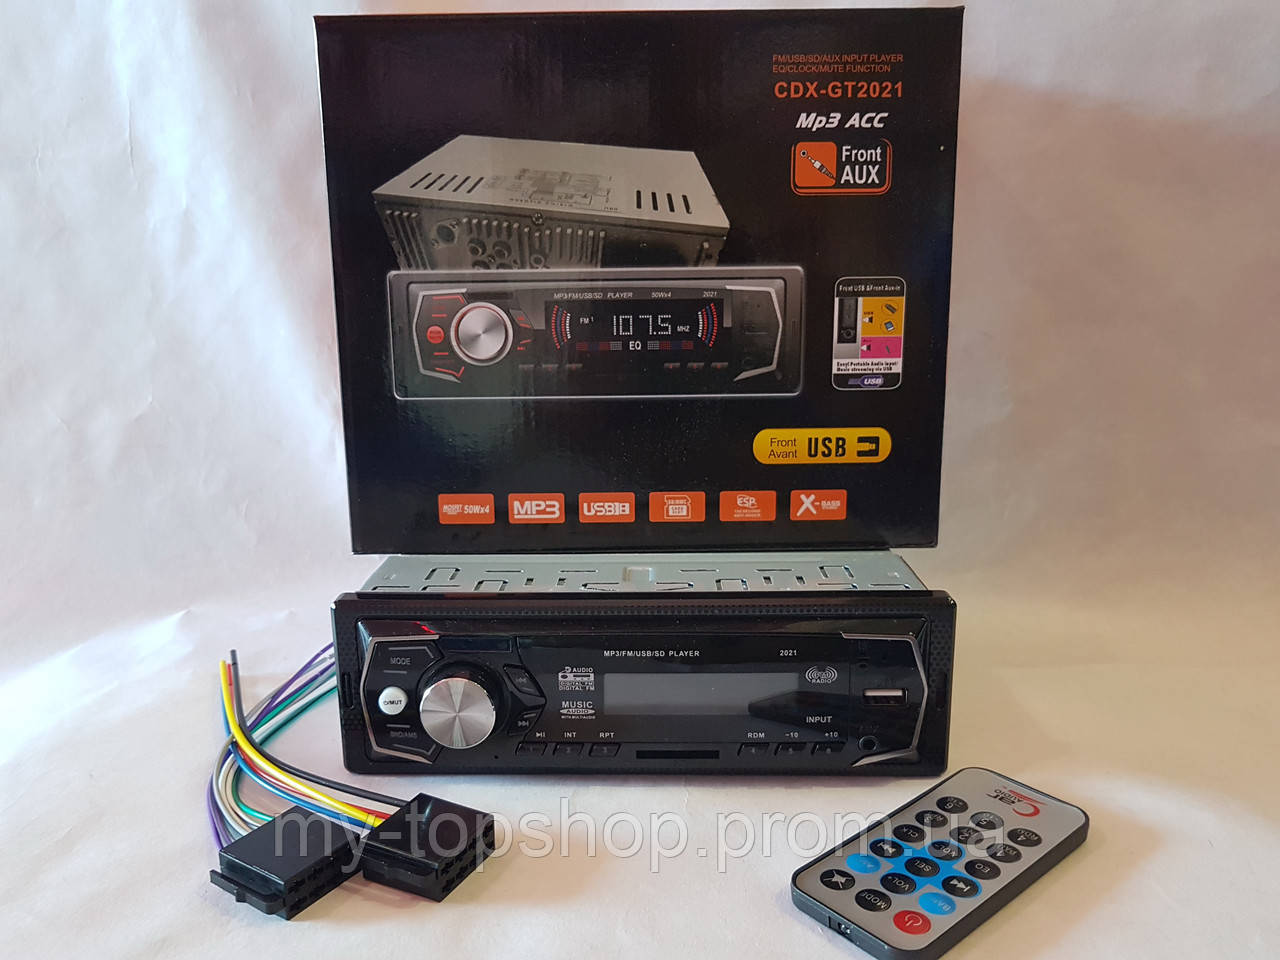 Авто Автомагнитола MP3, CDX-GT2021 (USB, SDHC, AUX, FM)